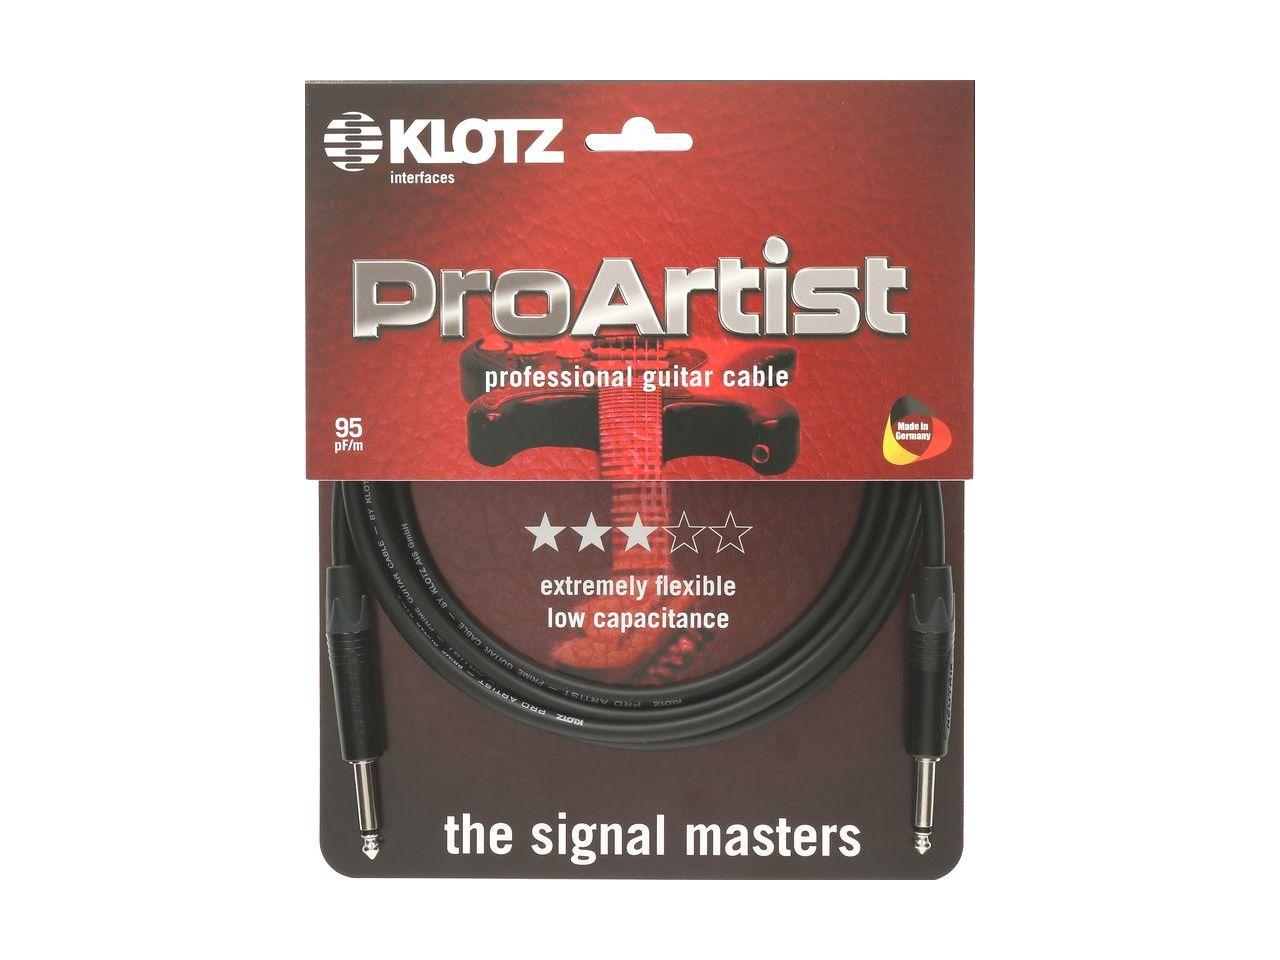 Klotz PRO ARTIST Instrumentenkabel 9m